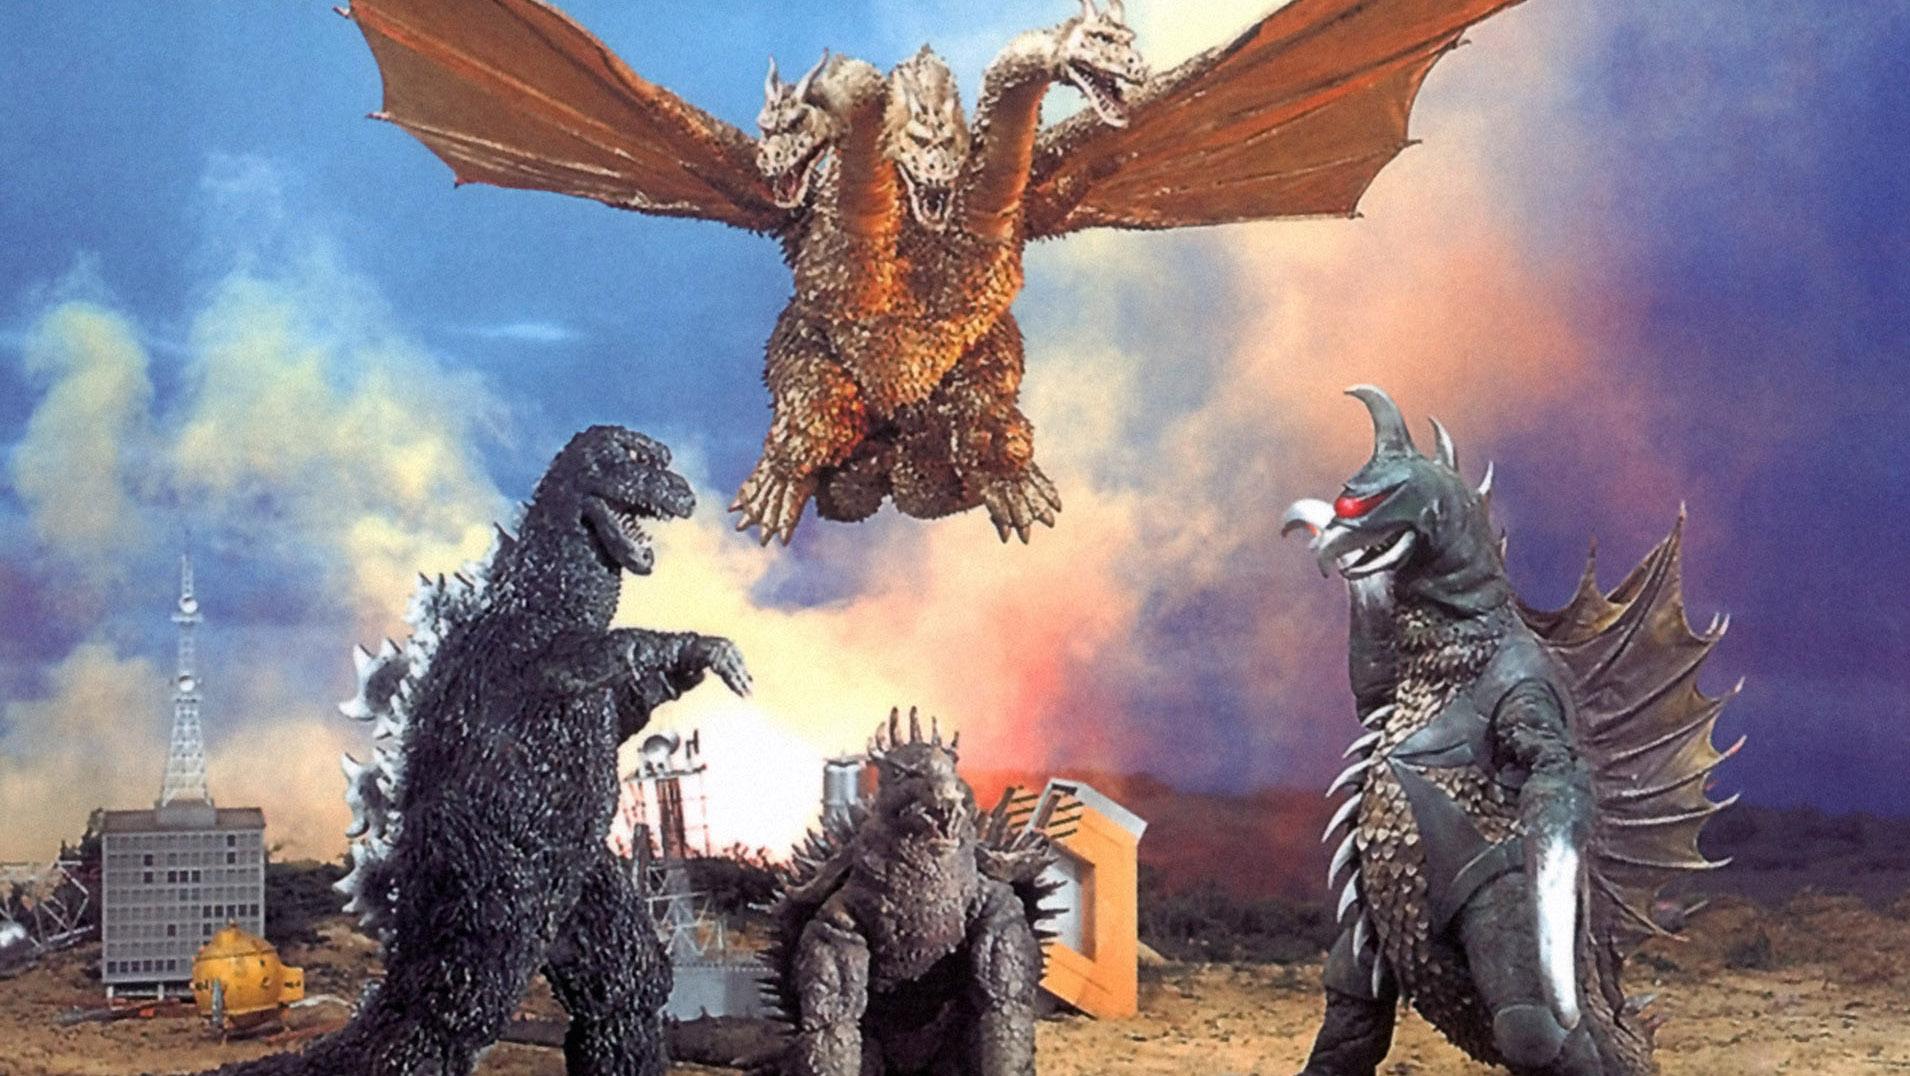 Godzilla On Monster Island Austin Alamo Drafthouse Cinema